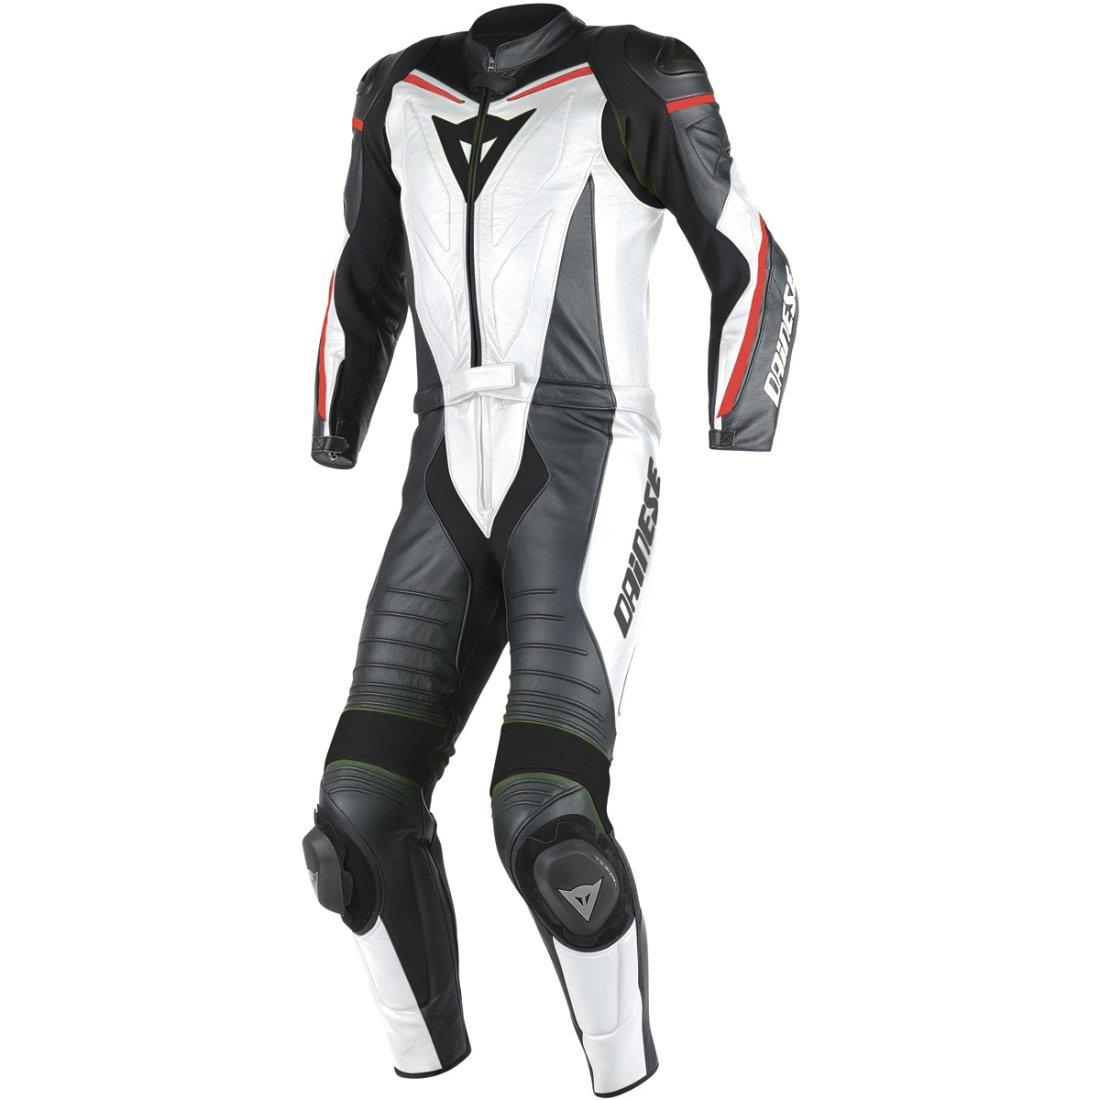 DAINESE Laguna Seca D1 White / Black / Red Fluo Suit